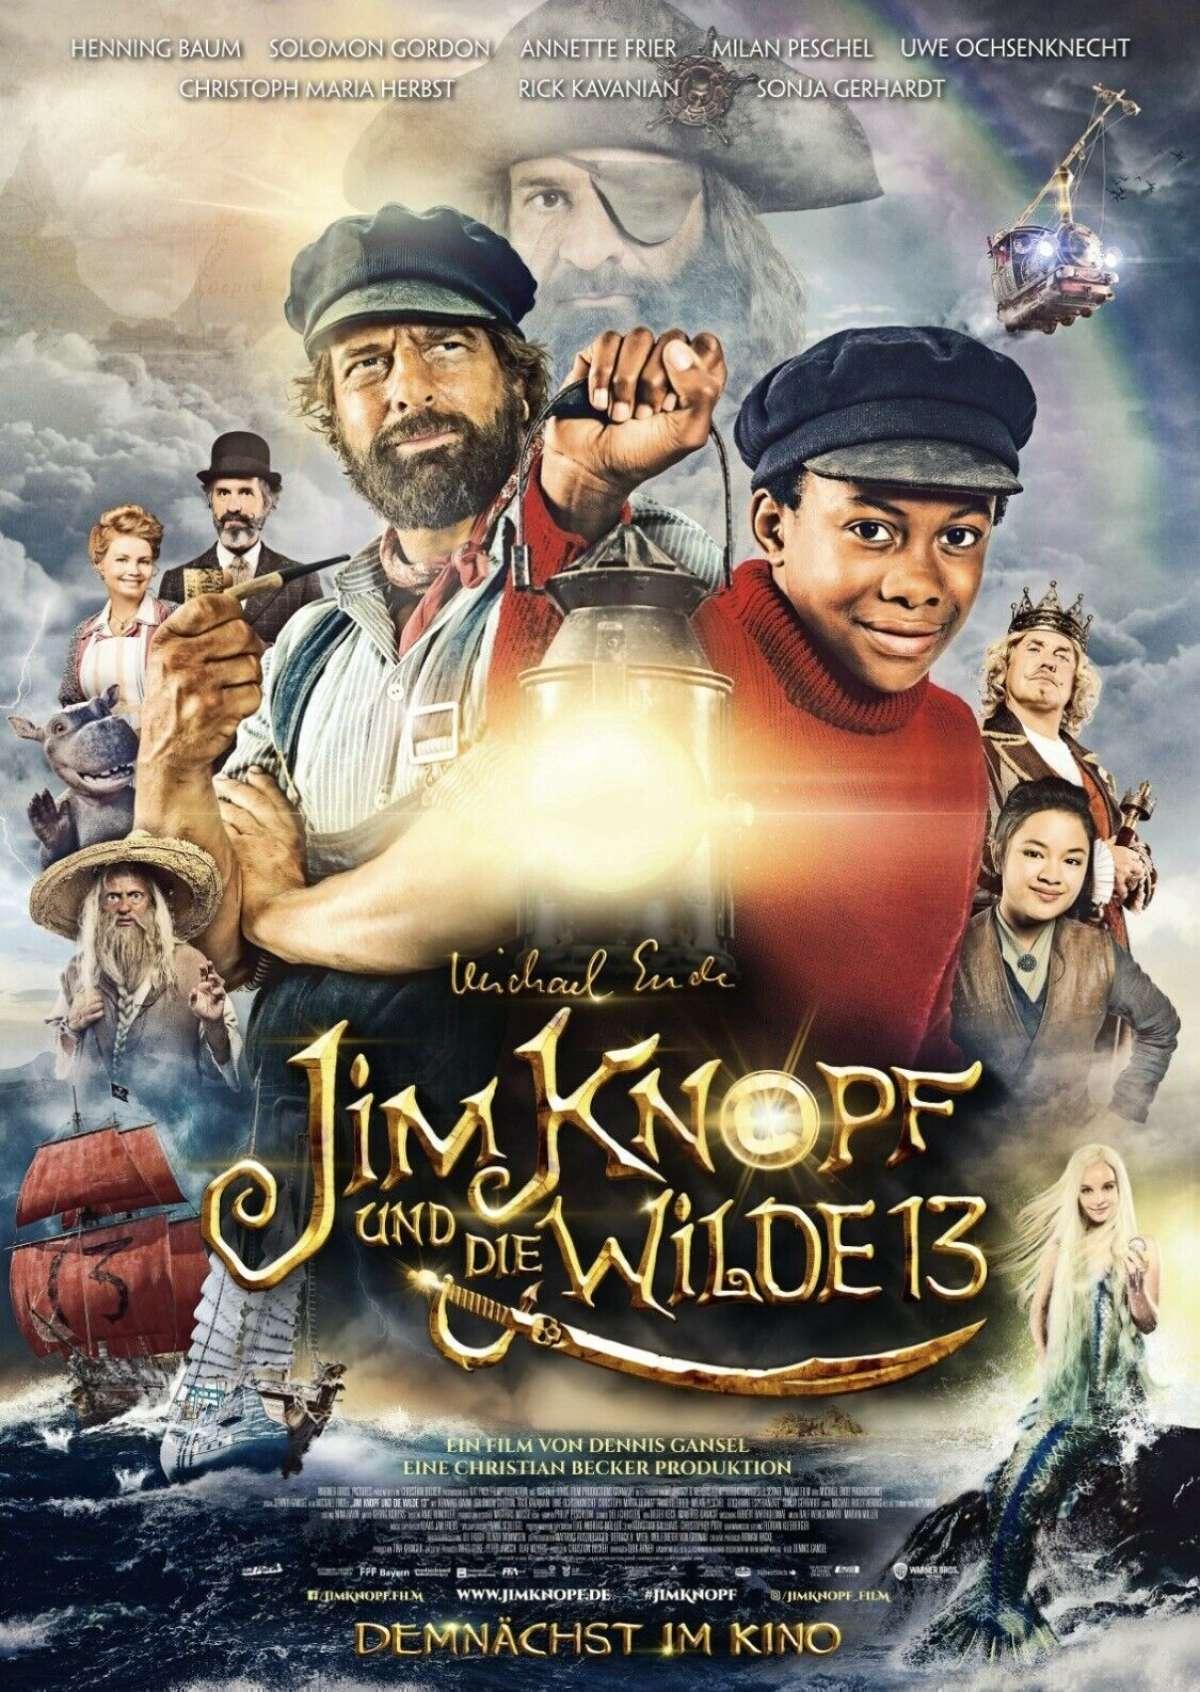 Jim Knopf und die Wilde 13 - Kino  - Bad Driburg